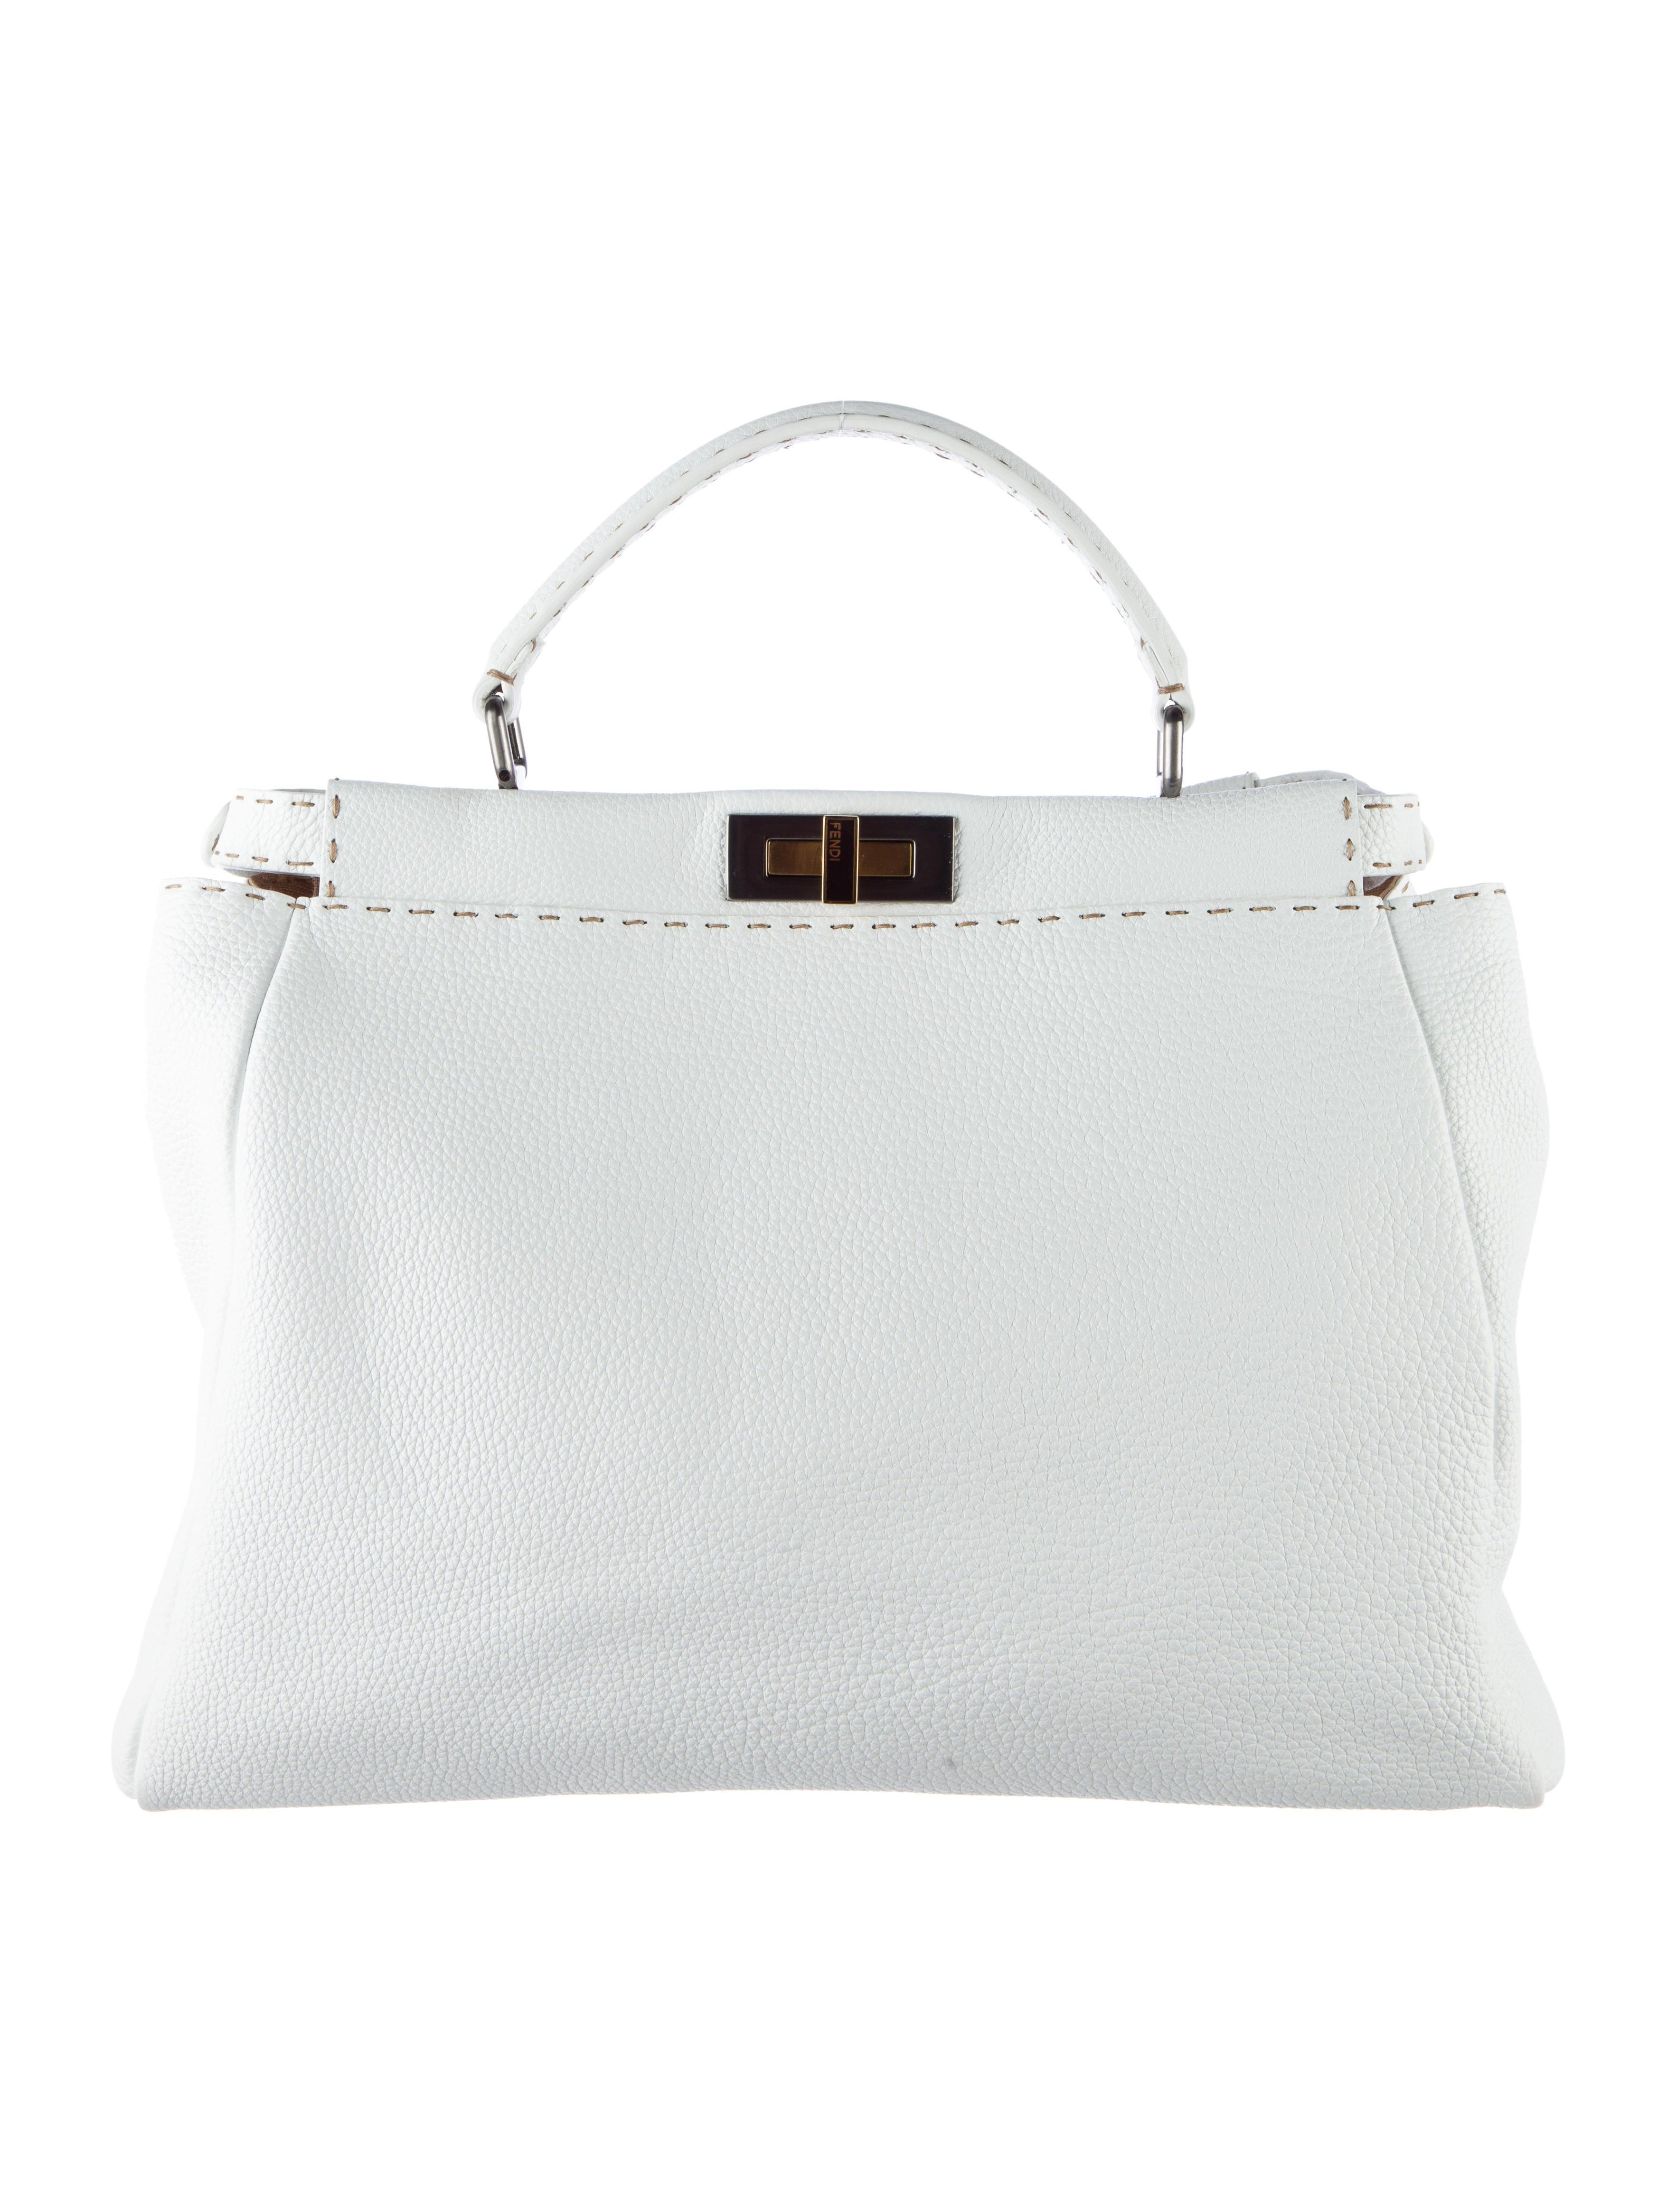 7d58578323 Fendi Large Selleria Peekaboo Bag - Handbags - FEN41526